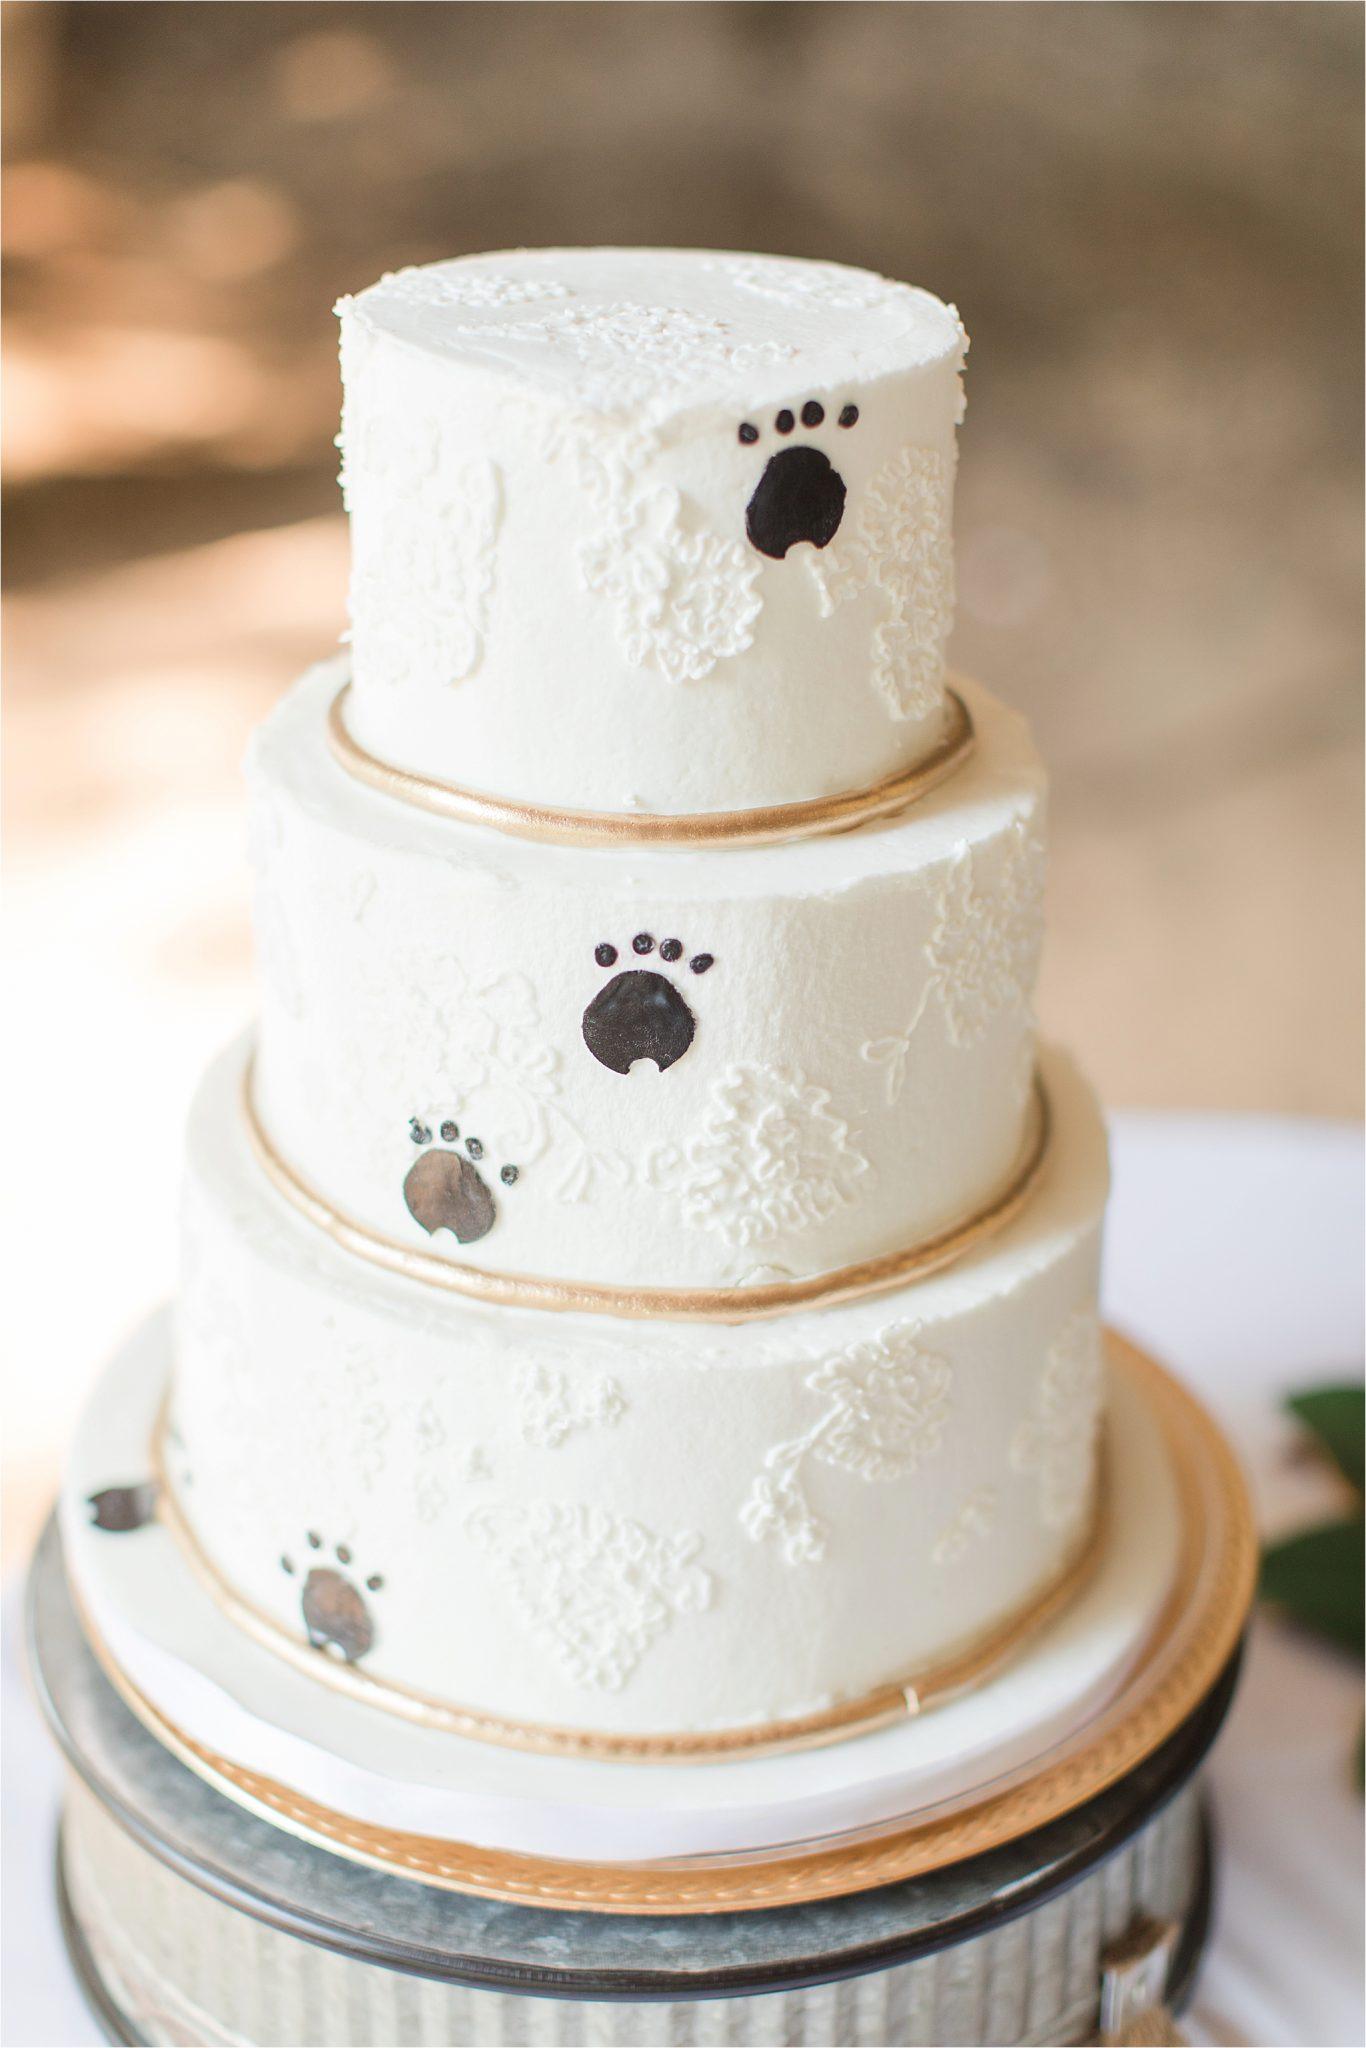 wedding cake-paw prints-dog cake-three tier wedding cake-gold accents